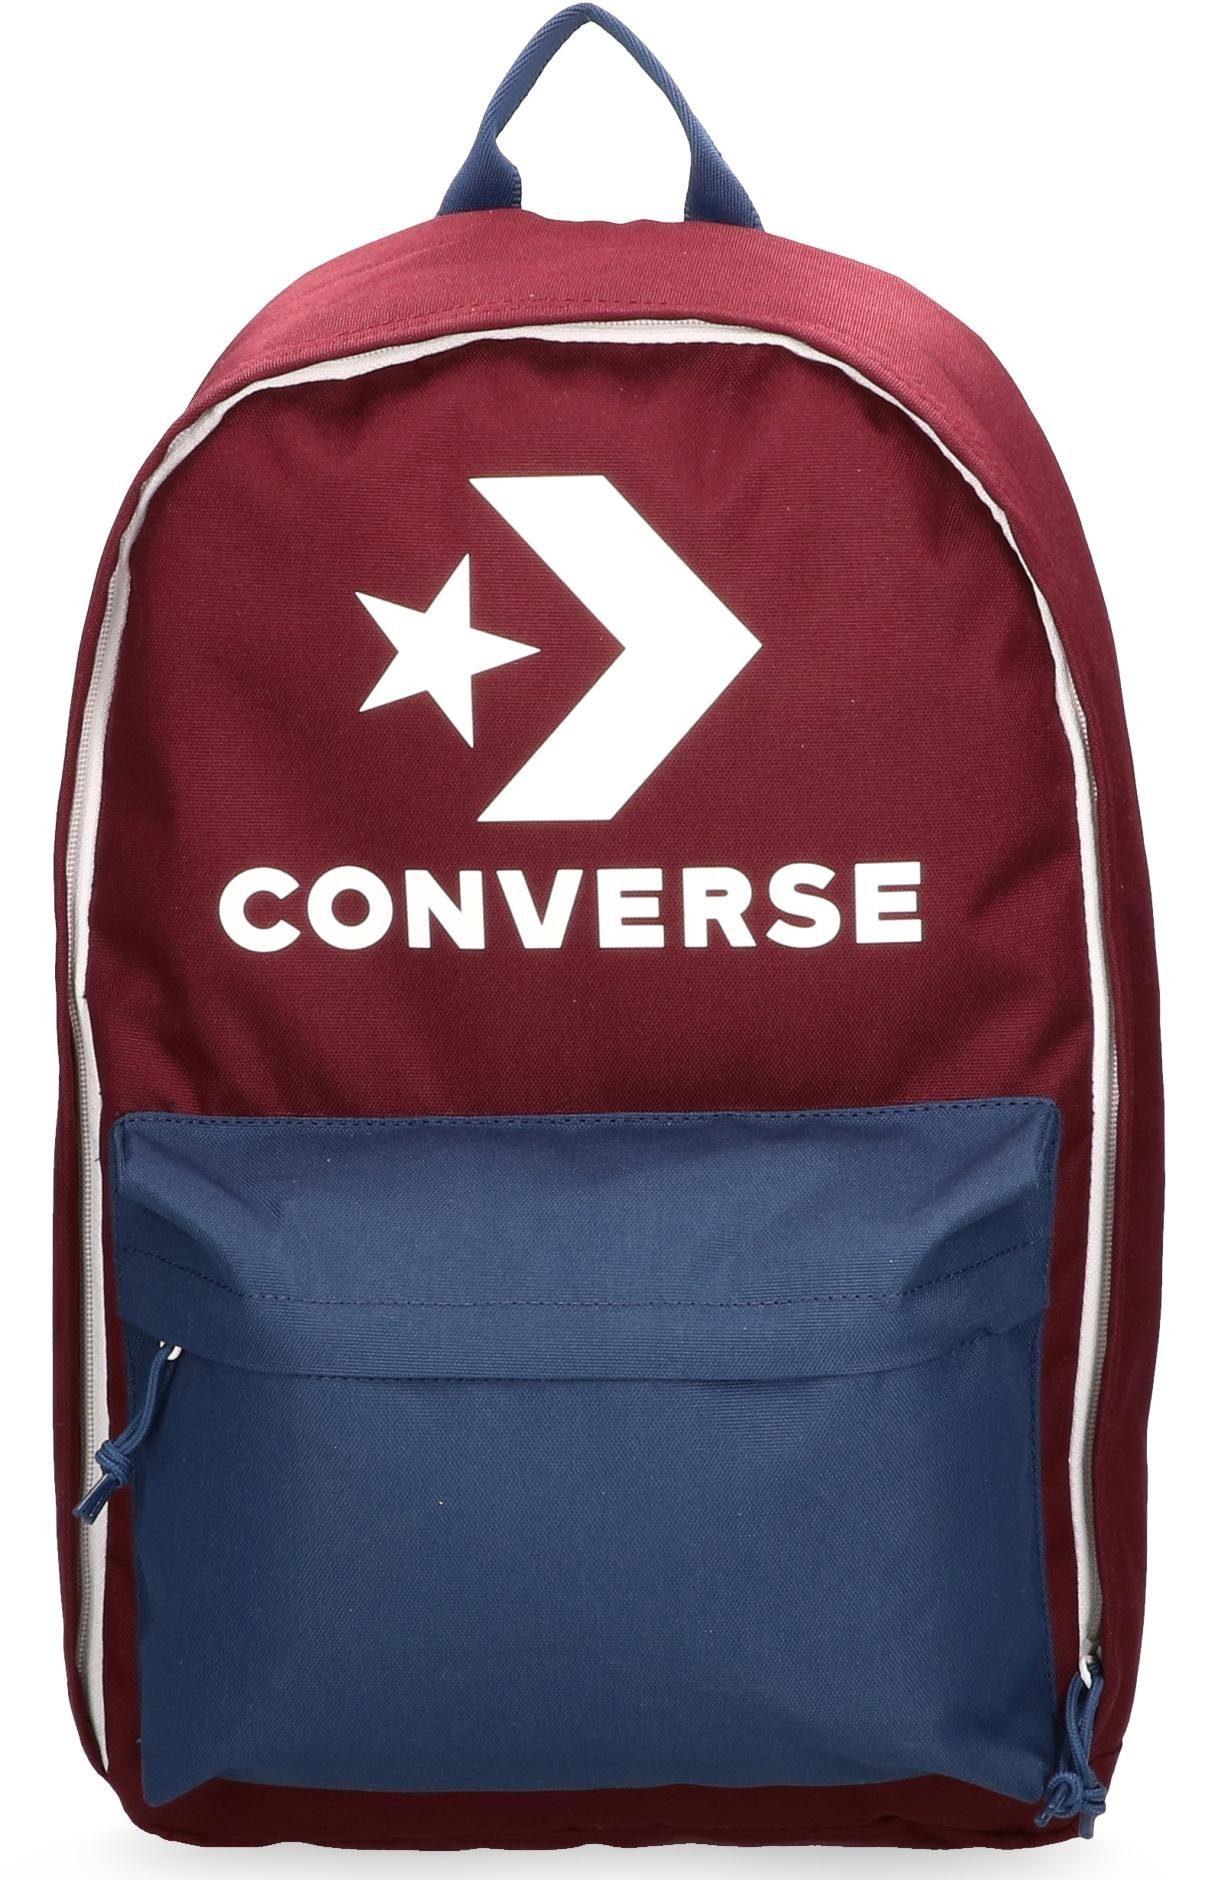 Converse Laptoprucksack »EDC 22 Backpack, Burgund Navy«